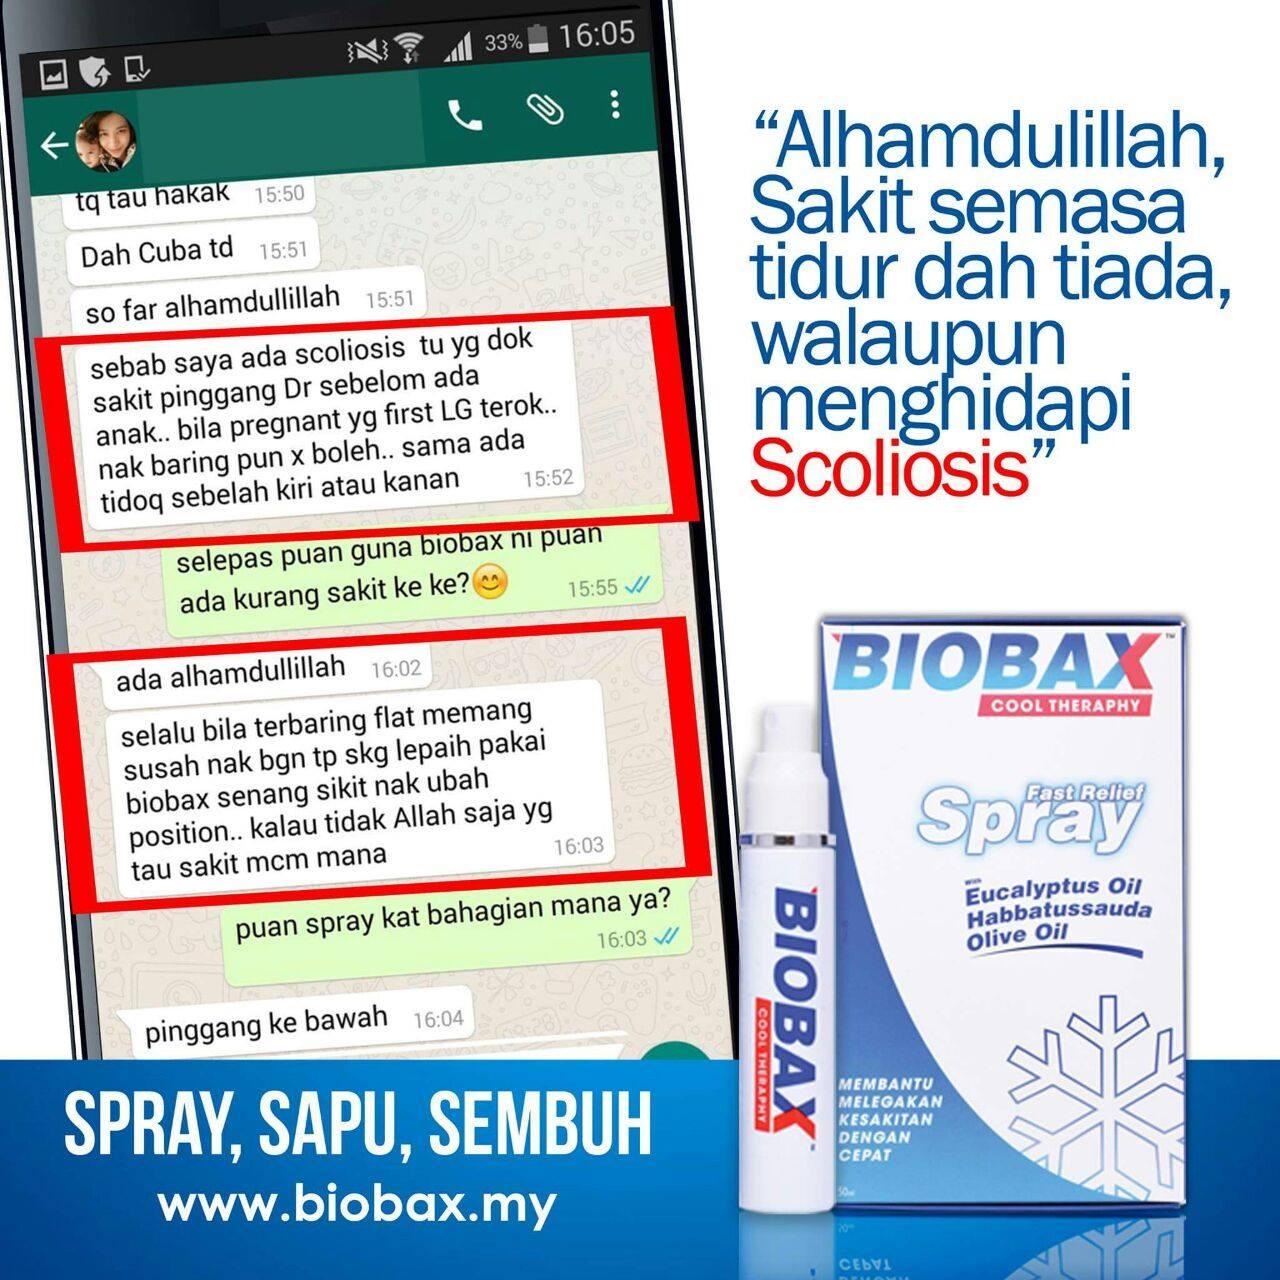 testimoni berkesan Biobax Cool Theraphy